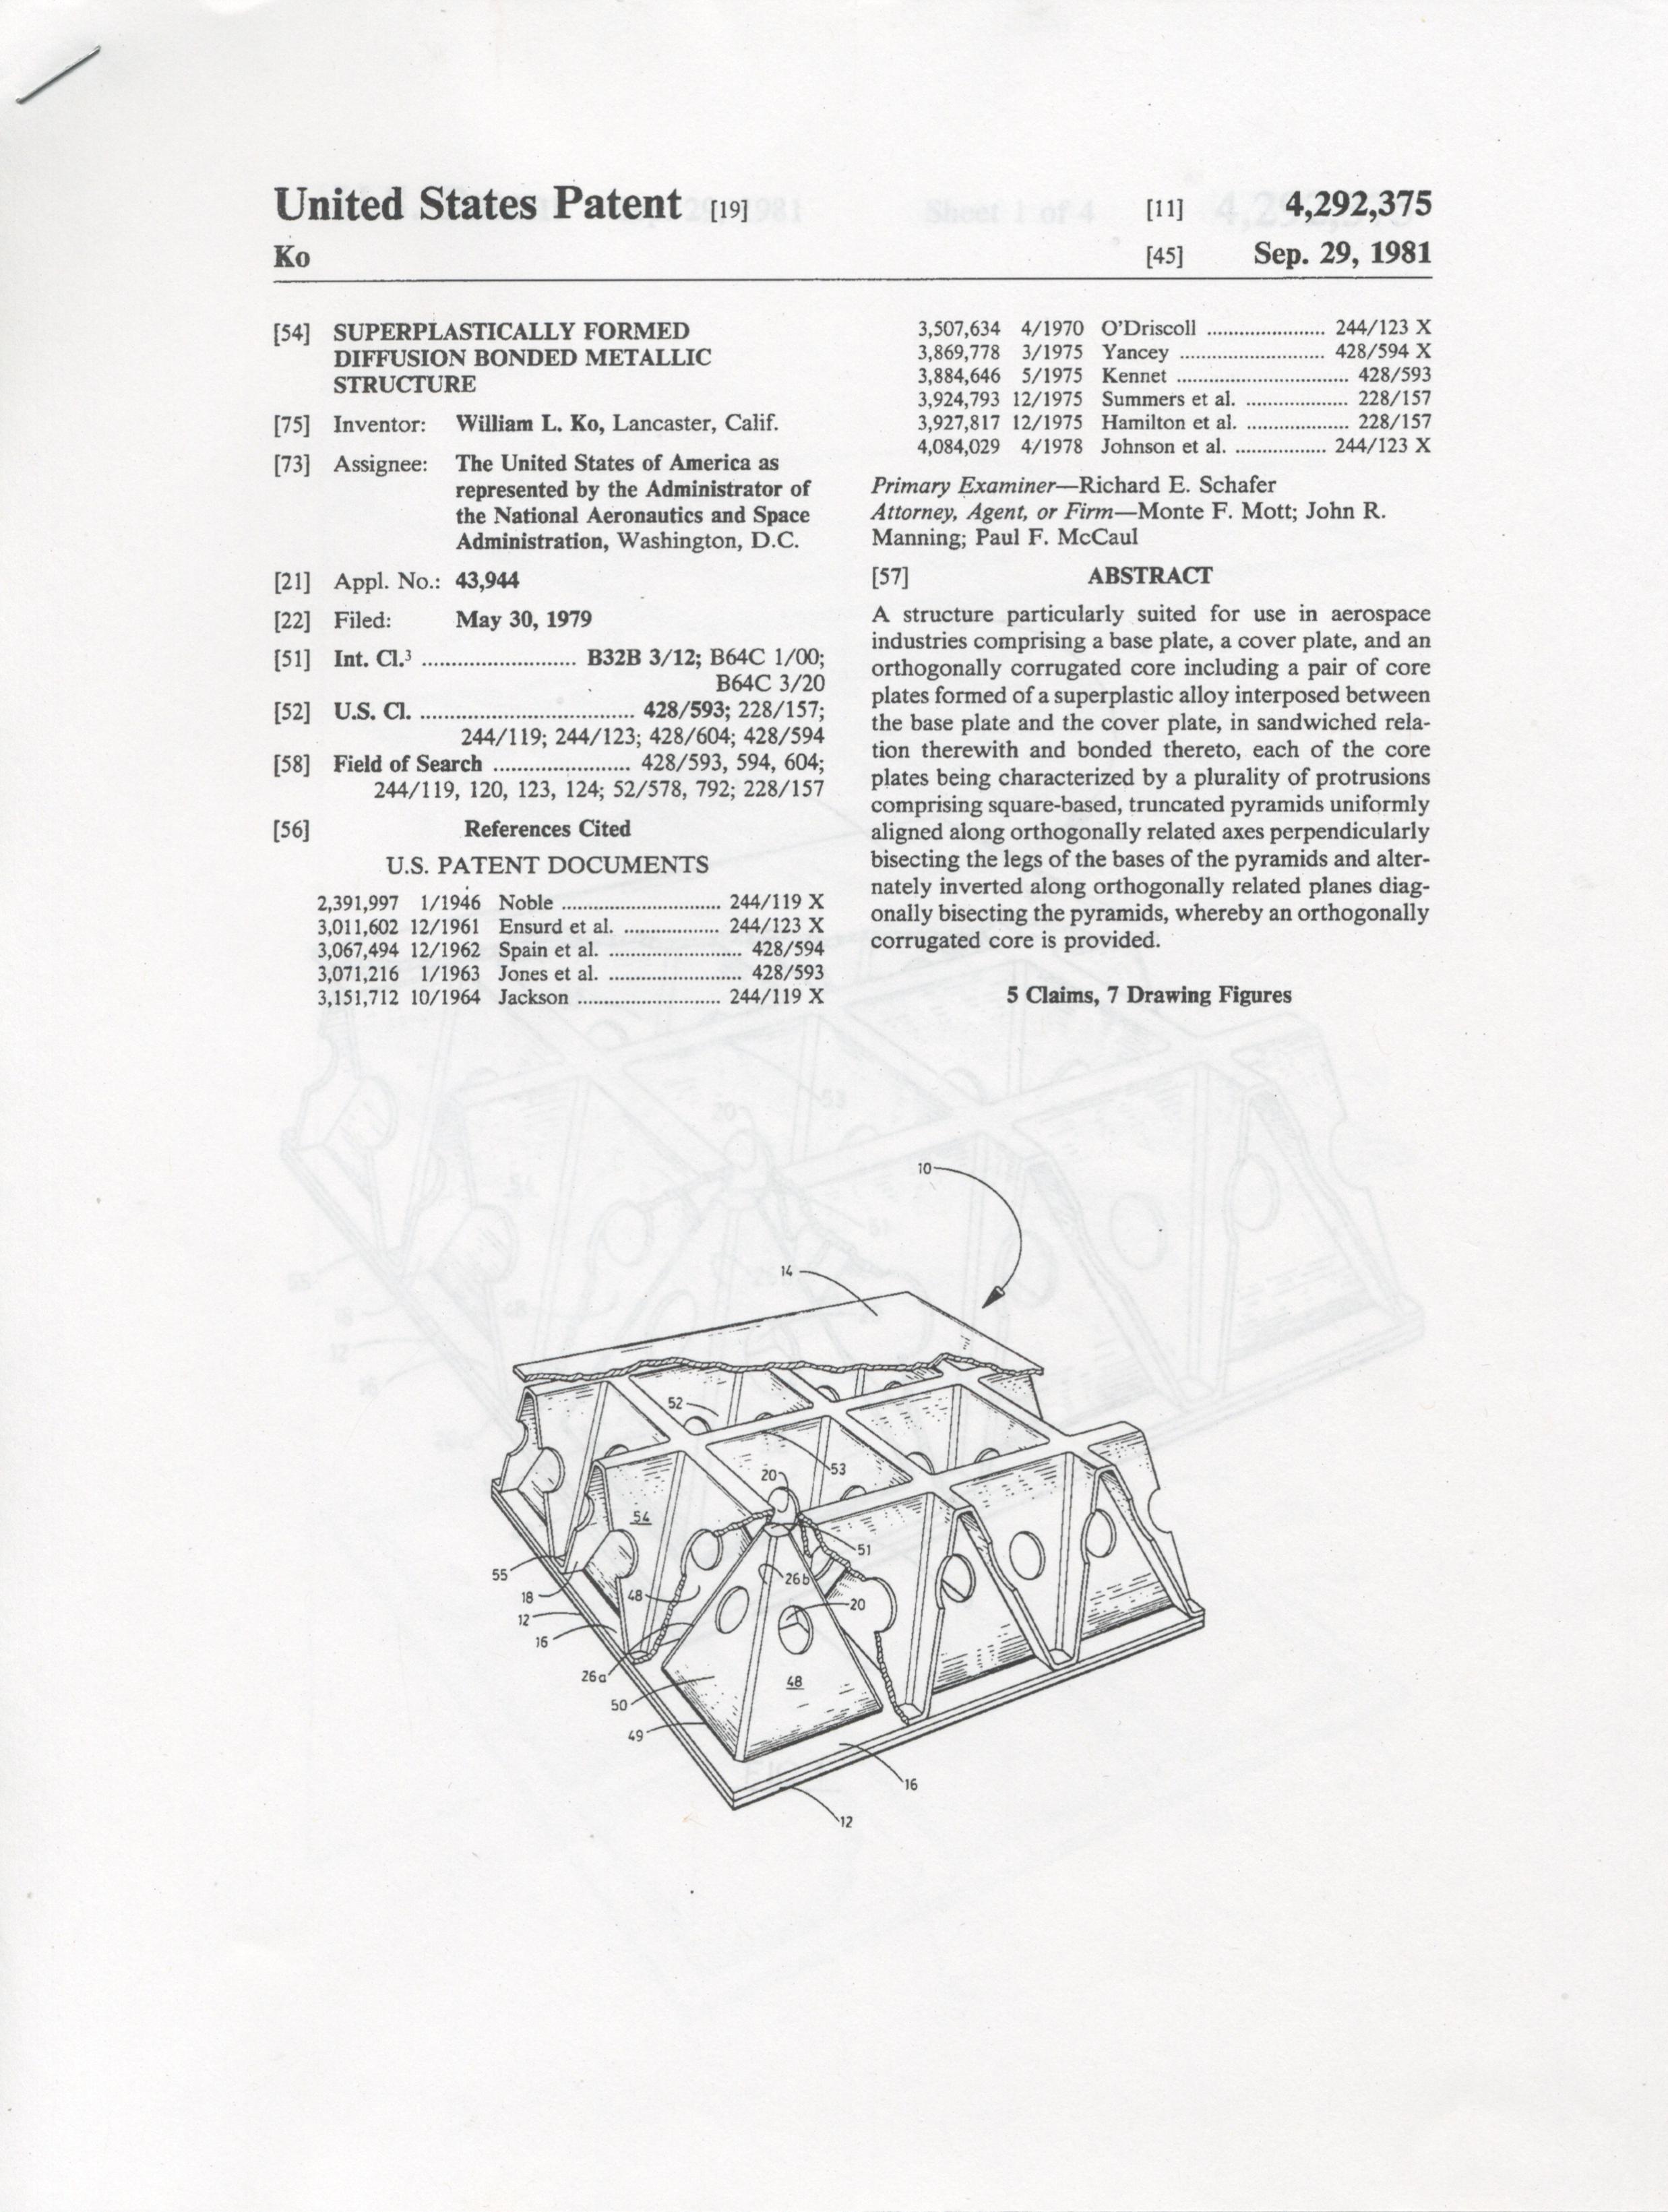 112_Documents of Dr. William L. Ko - 0008